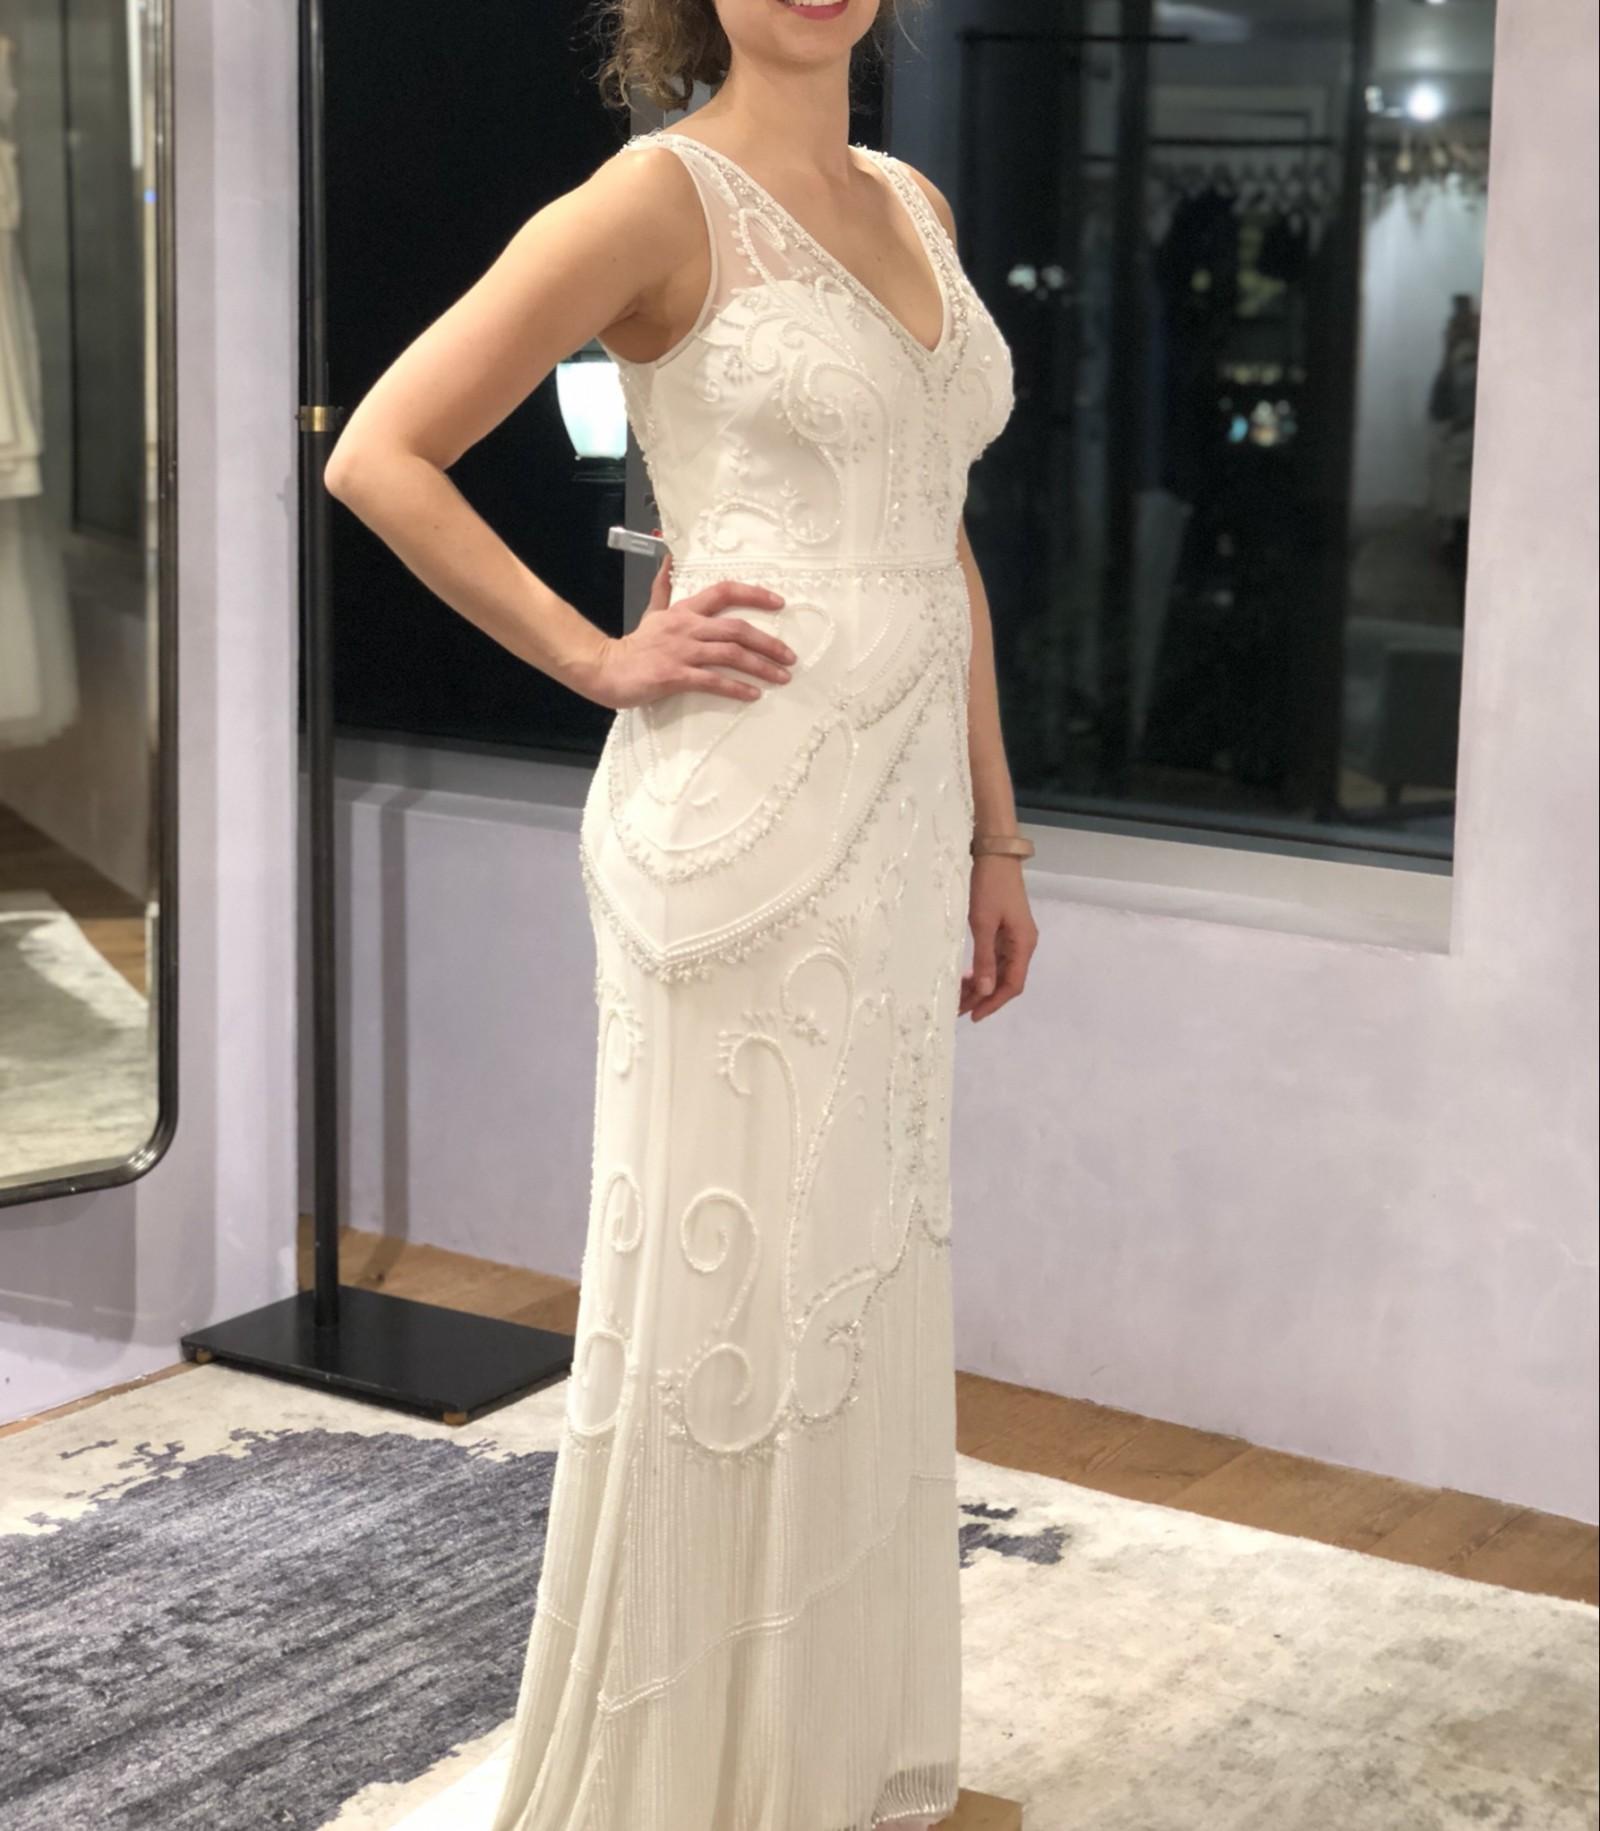 b676a7523d59 Bhldn Sorrento New Wedding Dress On Sale 20 Off Stillwhite United